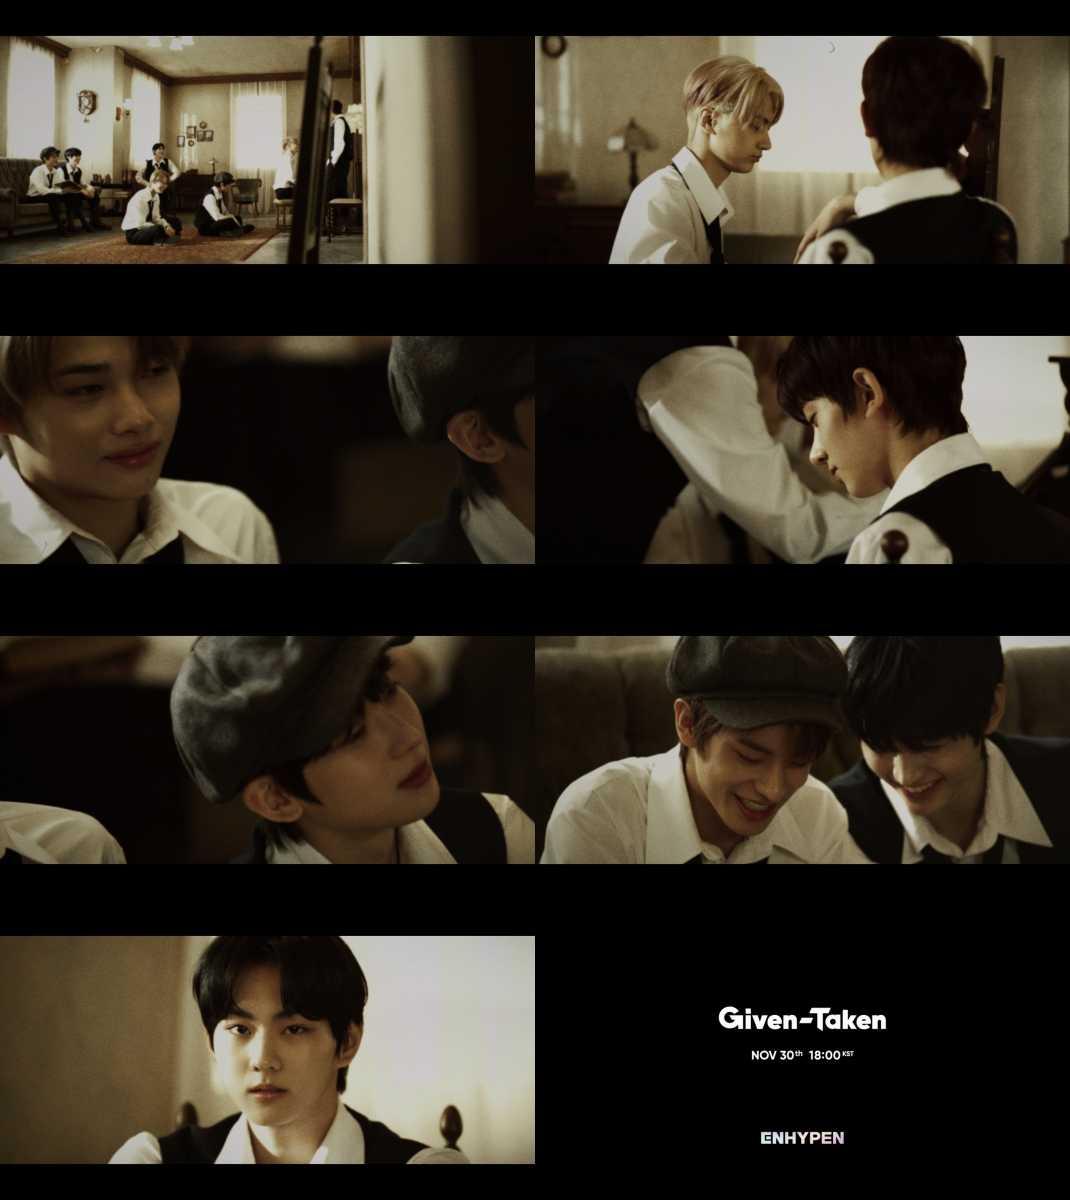 ENHYPEN、デビューリード曲「Given-Taken」ミステリアスな1stオフィシャルティーザー公開!